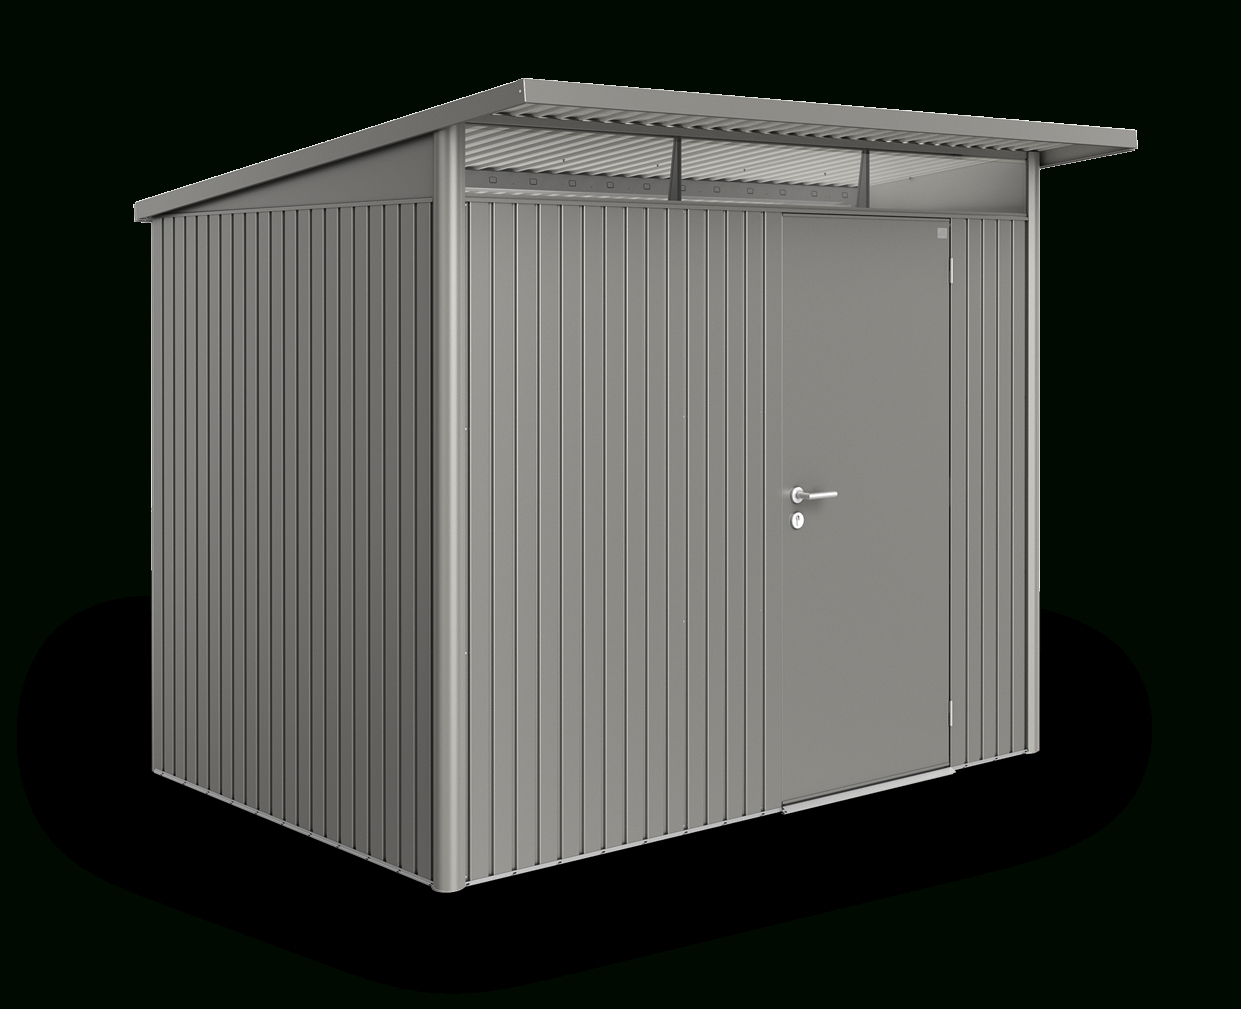 Abri De Jardin Biohort Avantgarde® - Moderne Avec Toit En ... avec Abri De Jardin Metal 5M2 Toit Plat